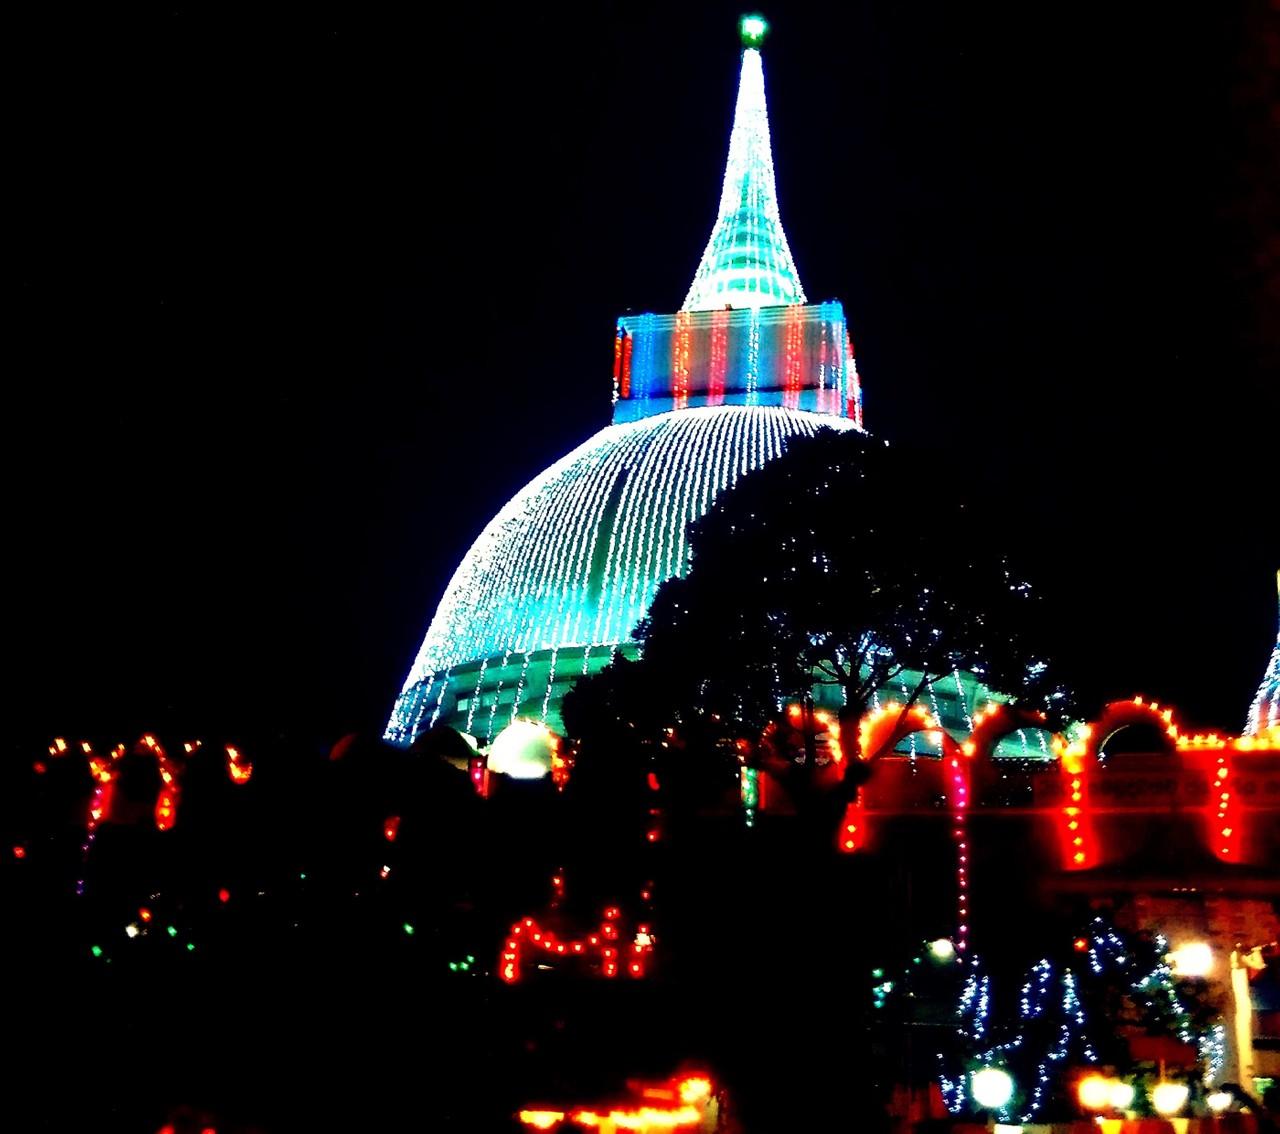 KalutaraStupa on illuminated Vesak Poya Day (Dreamstime)